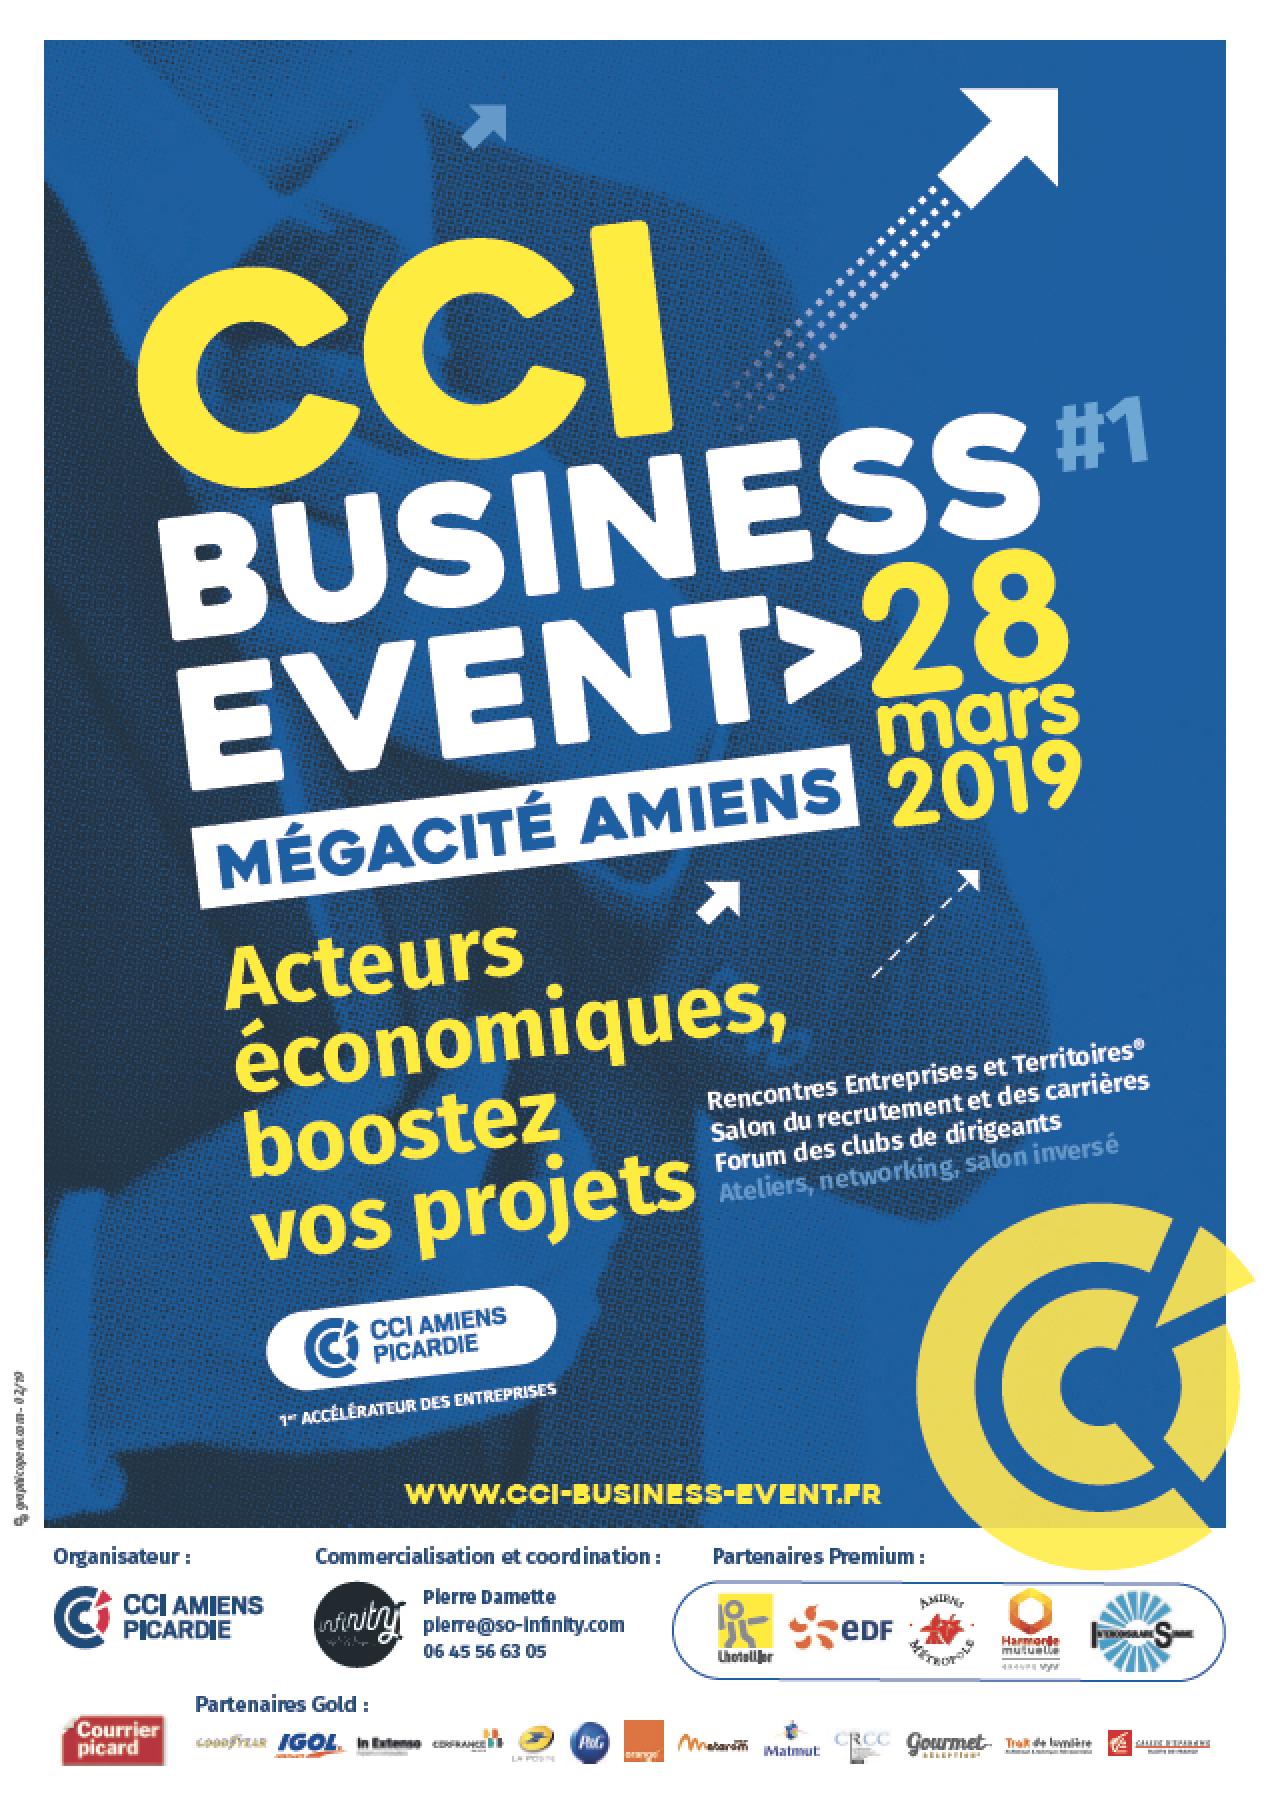 CCI BUSINESS EVENT 2019